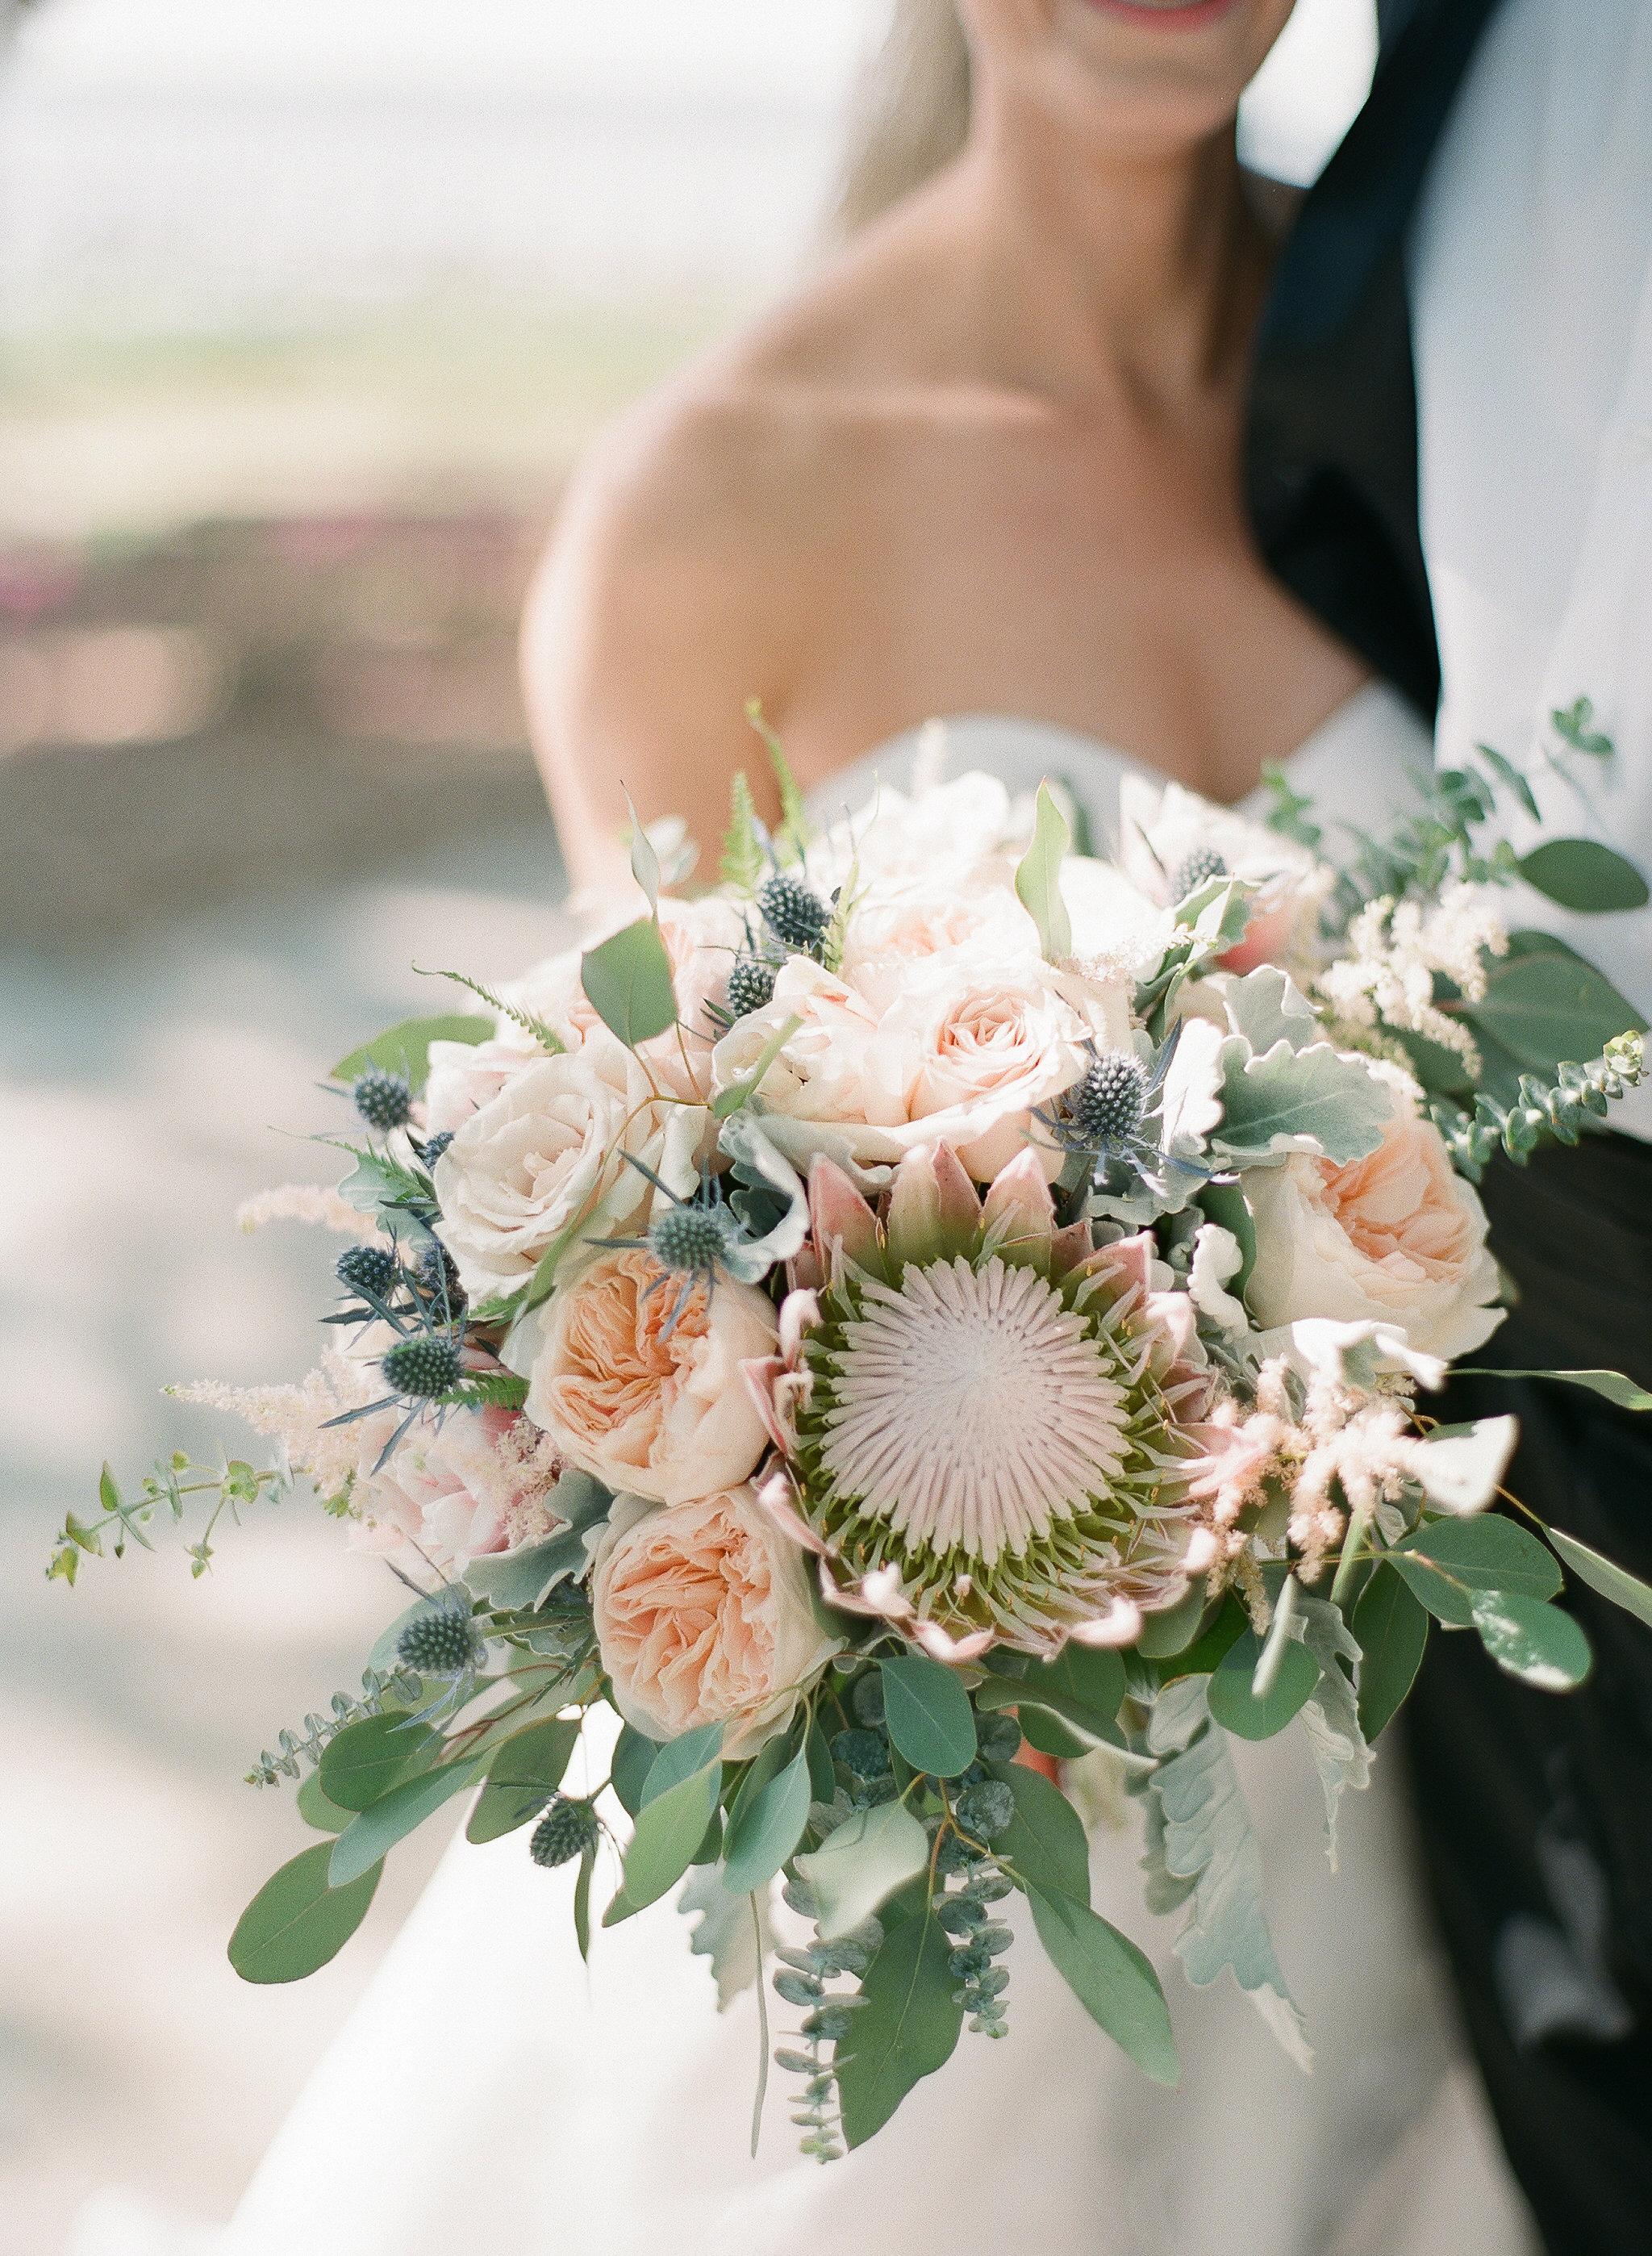 paraiso-event-design-morgan-danny-charleston-wedding-lowndes-grove-spring-03.jpg